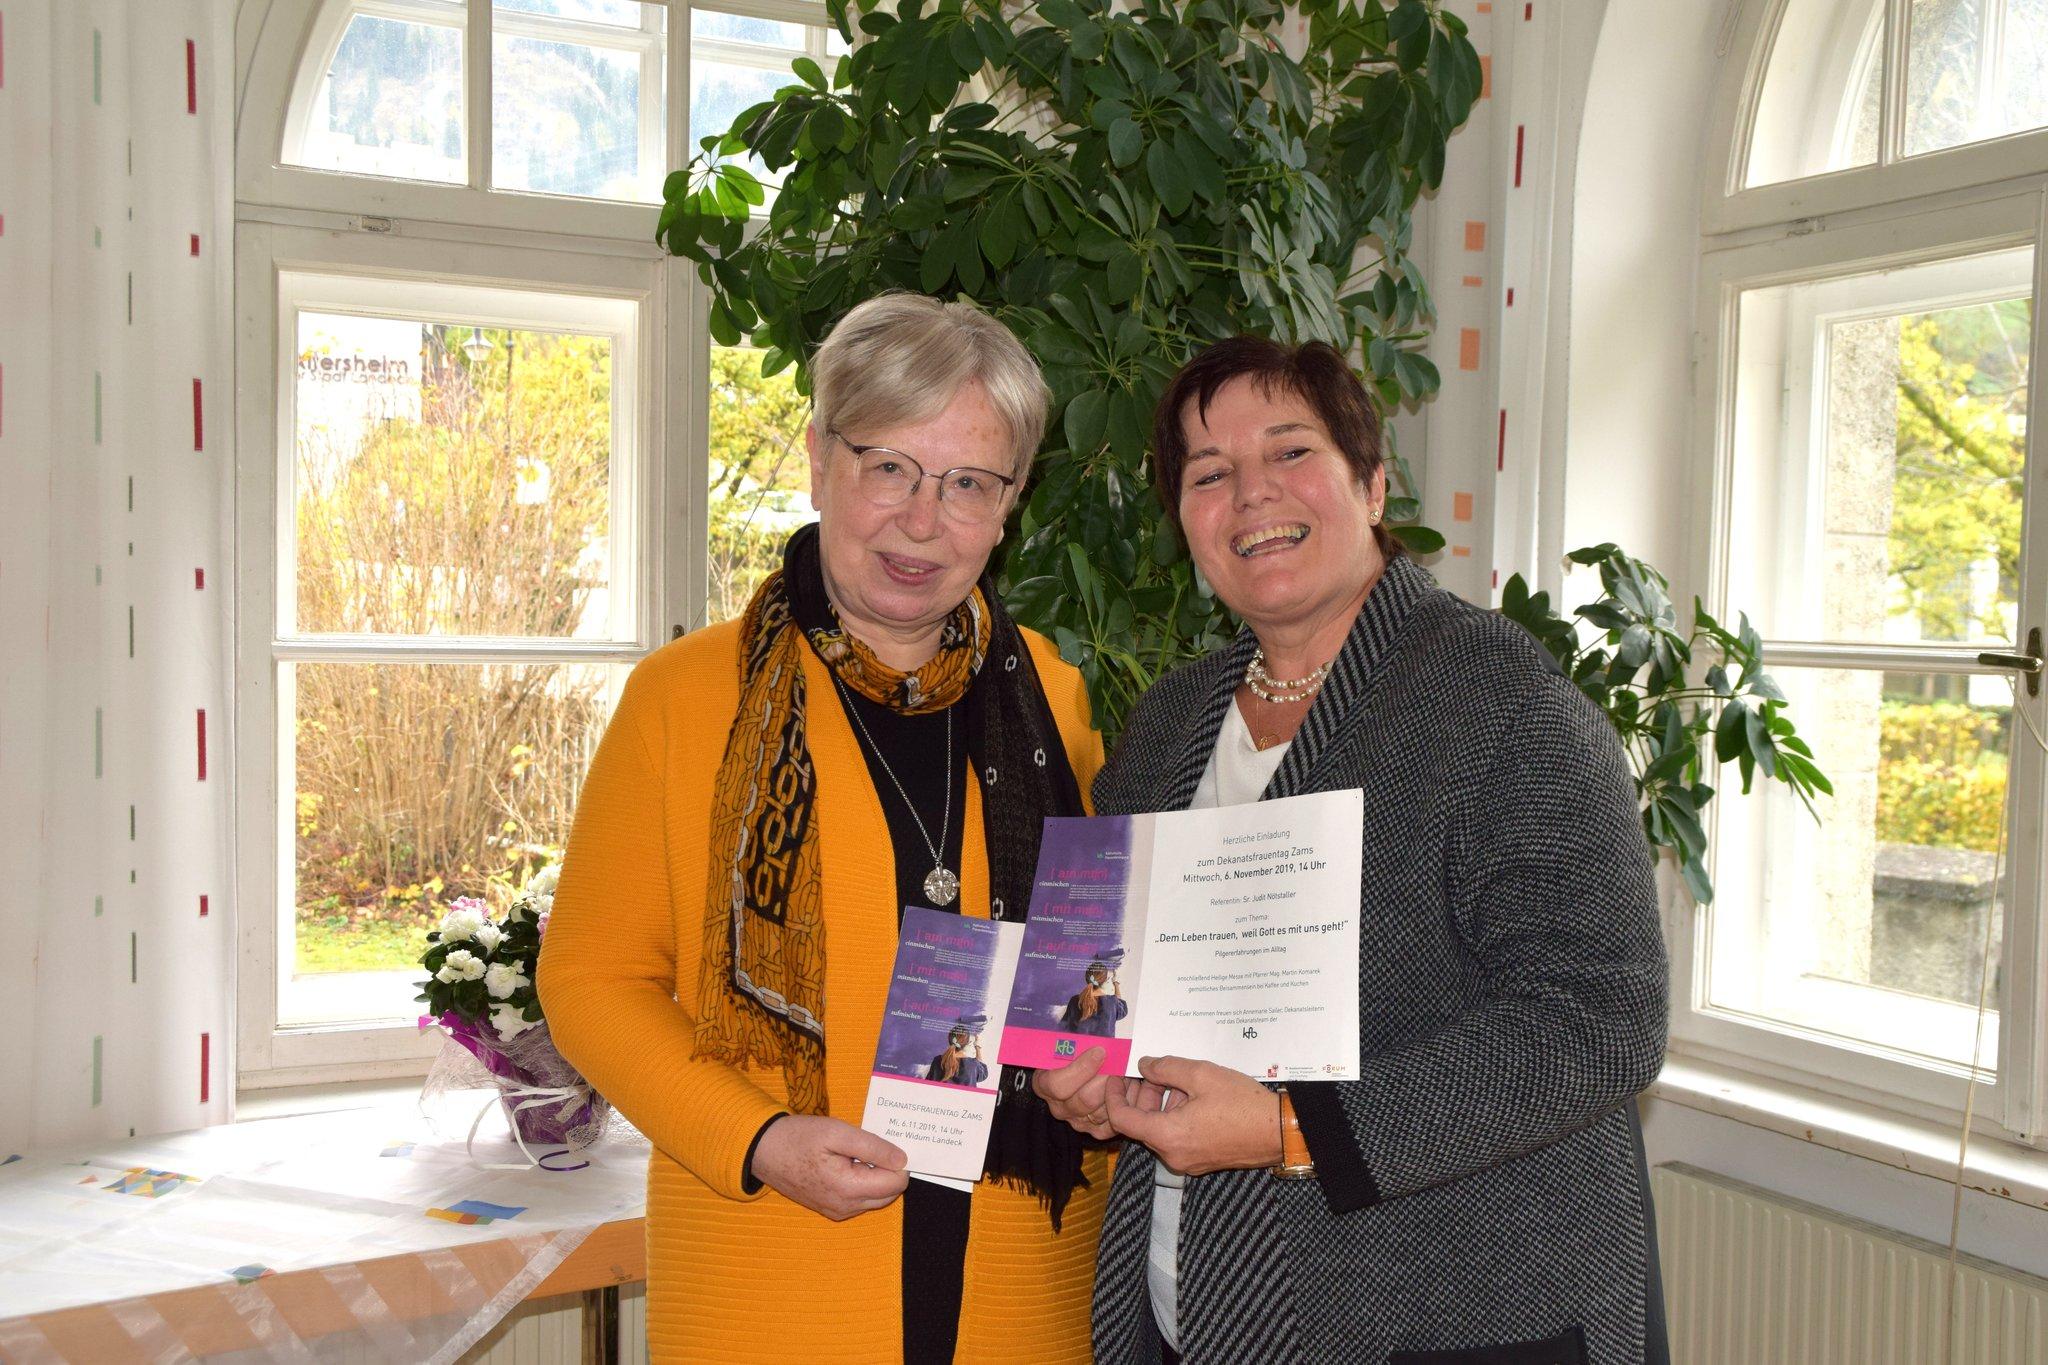 Bekanntschaften in Landeck - Partnersuche & Kontakte